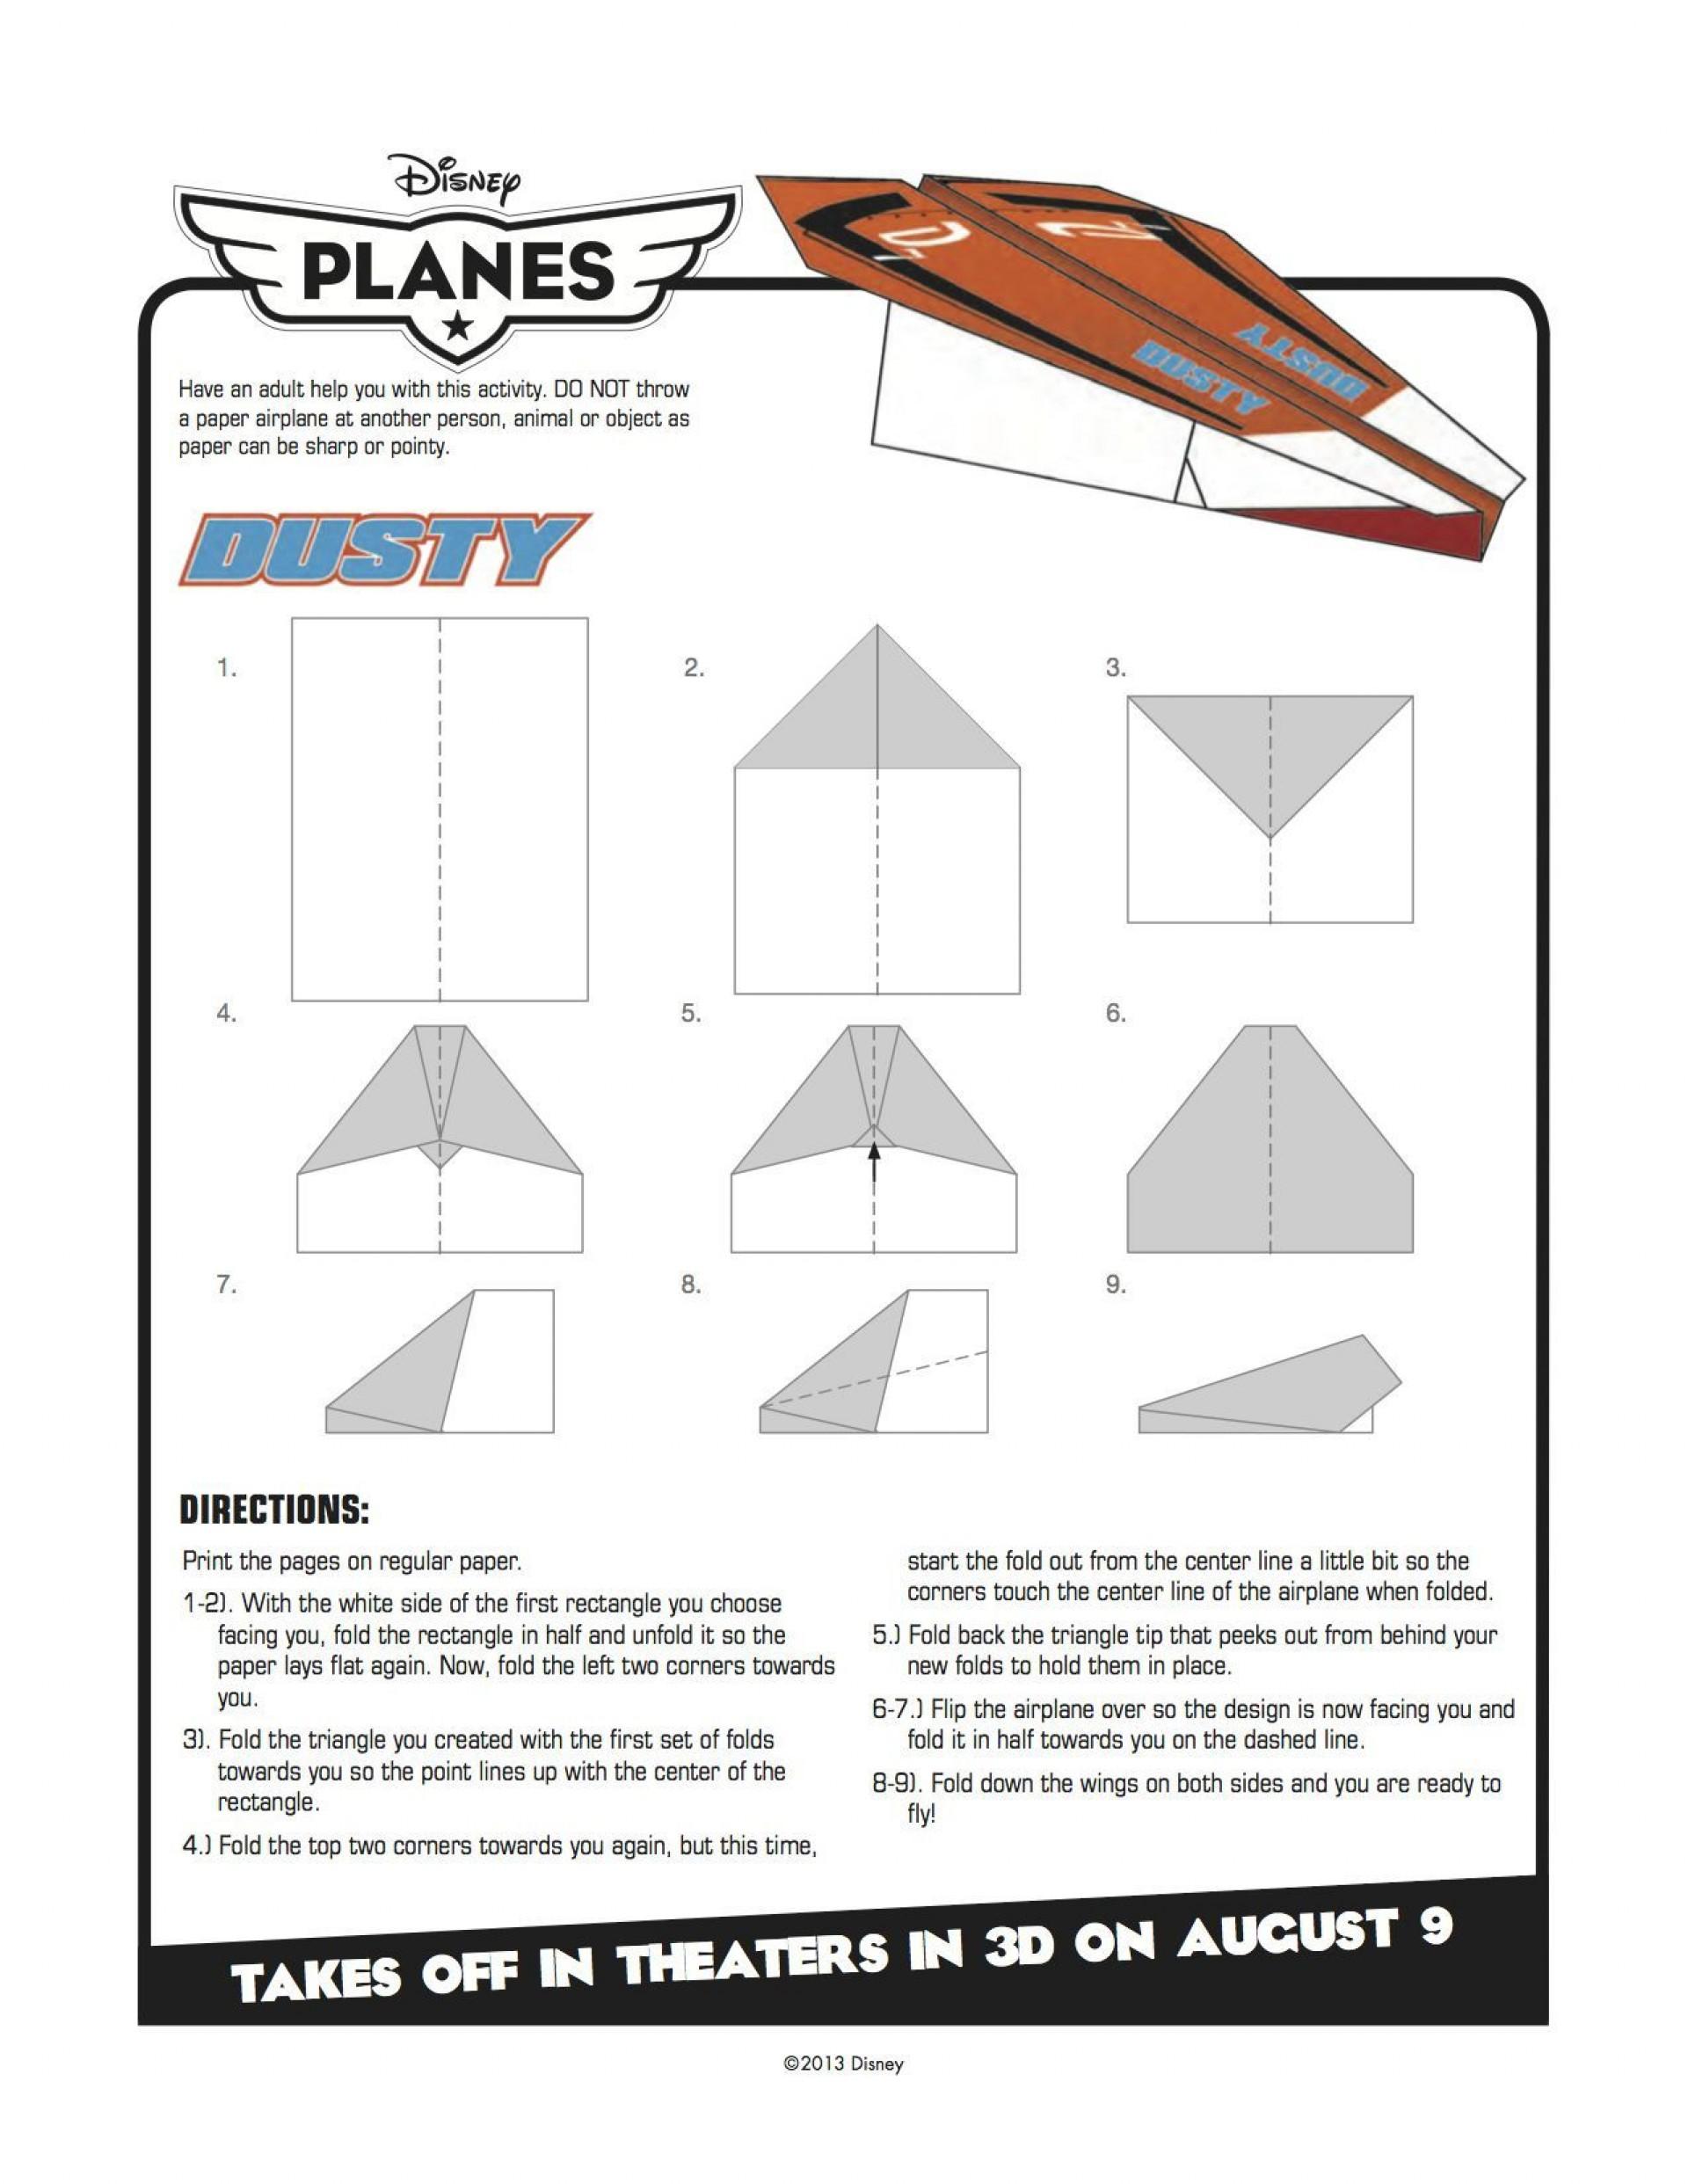 003 Surprising Printable Paper Airplane Pattern Inspiration  Free Plane Design Designs-printable Template1920